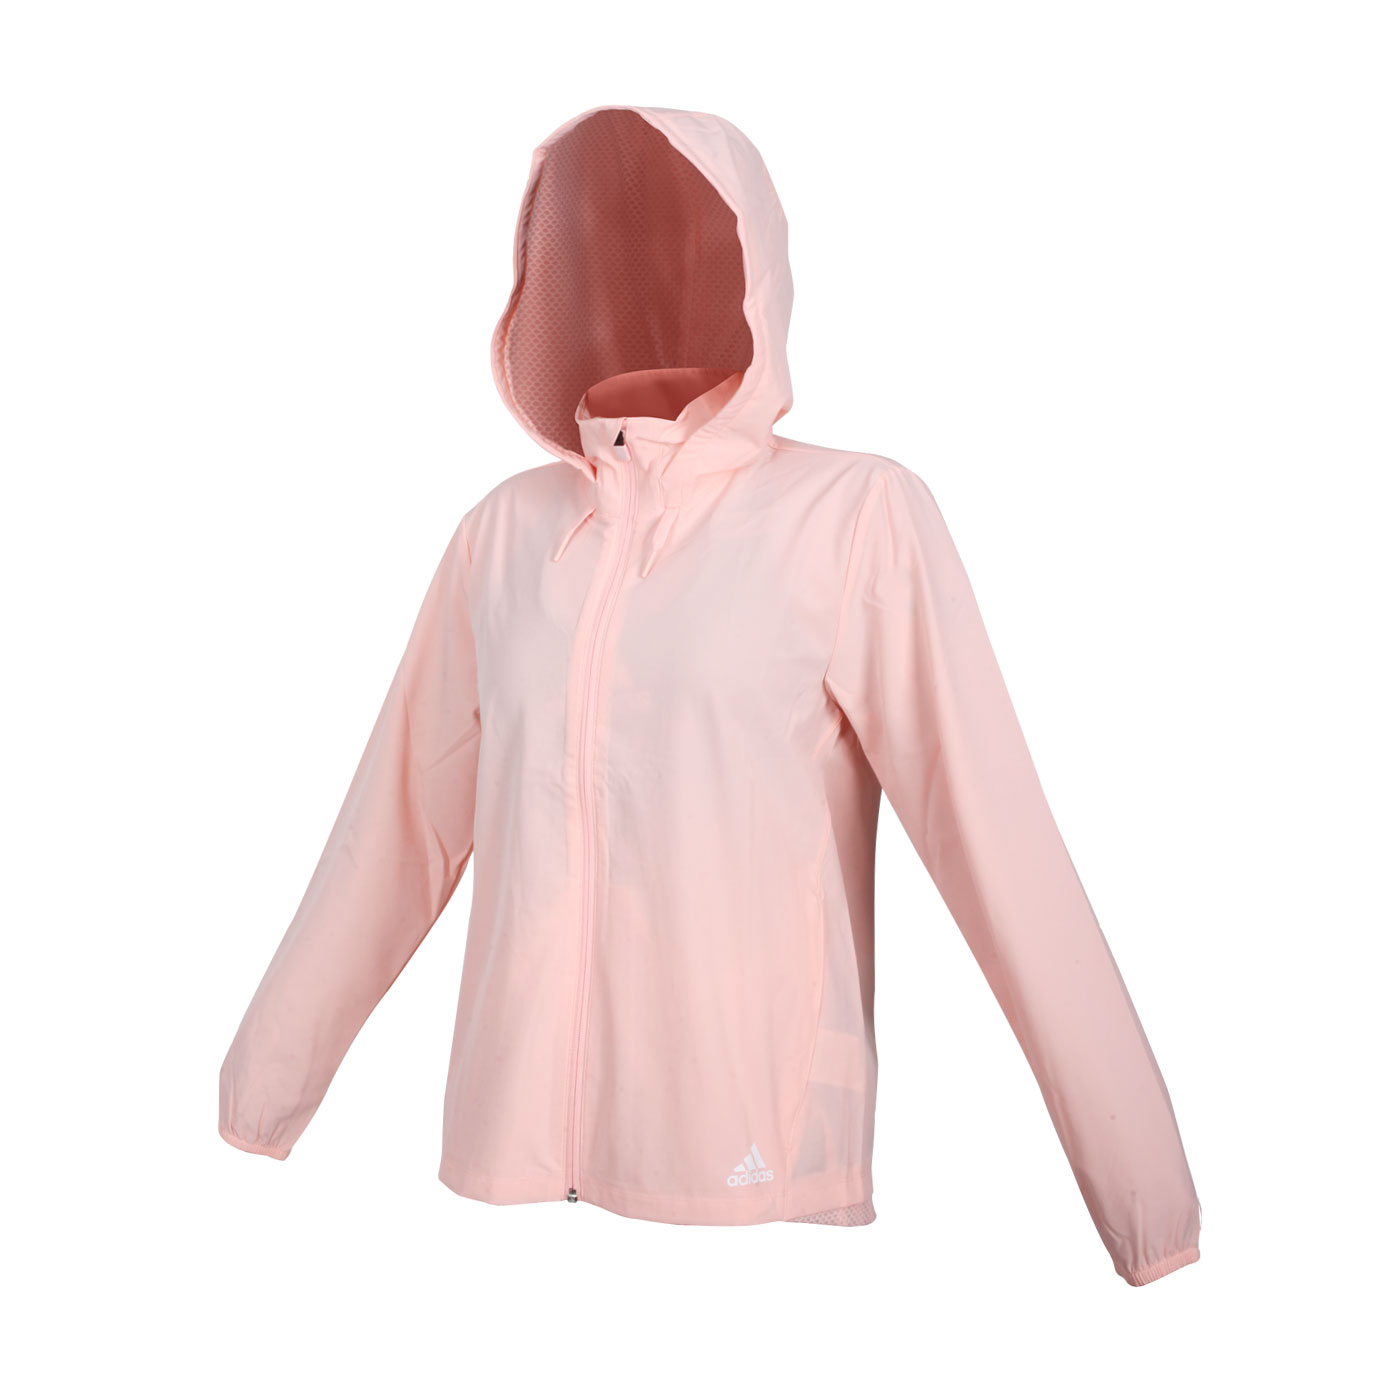 ADIDAS 女款長袖連帽外套 GQ5192 - 粉橘